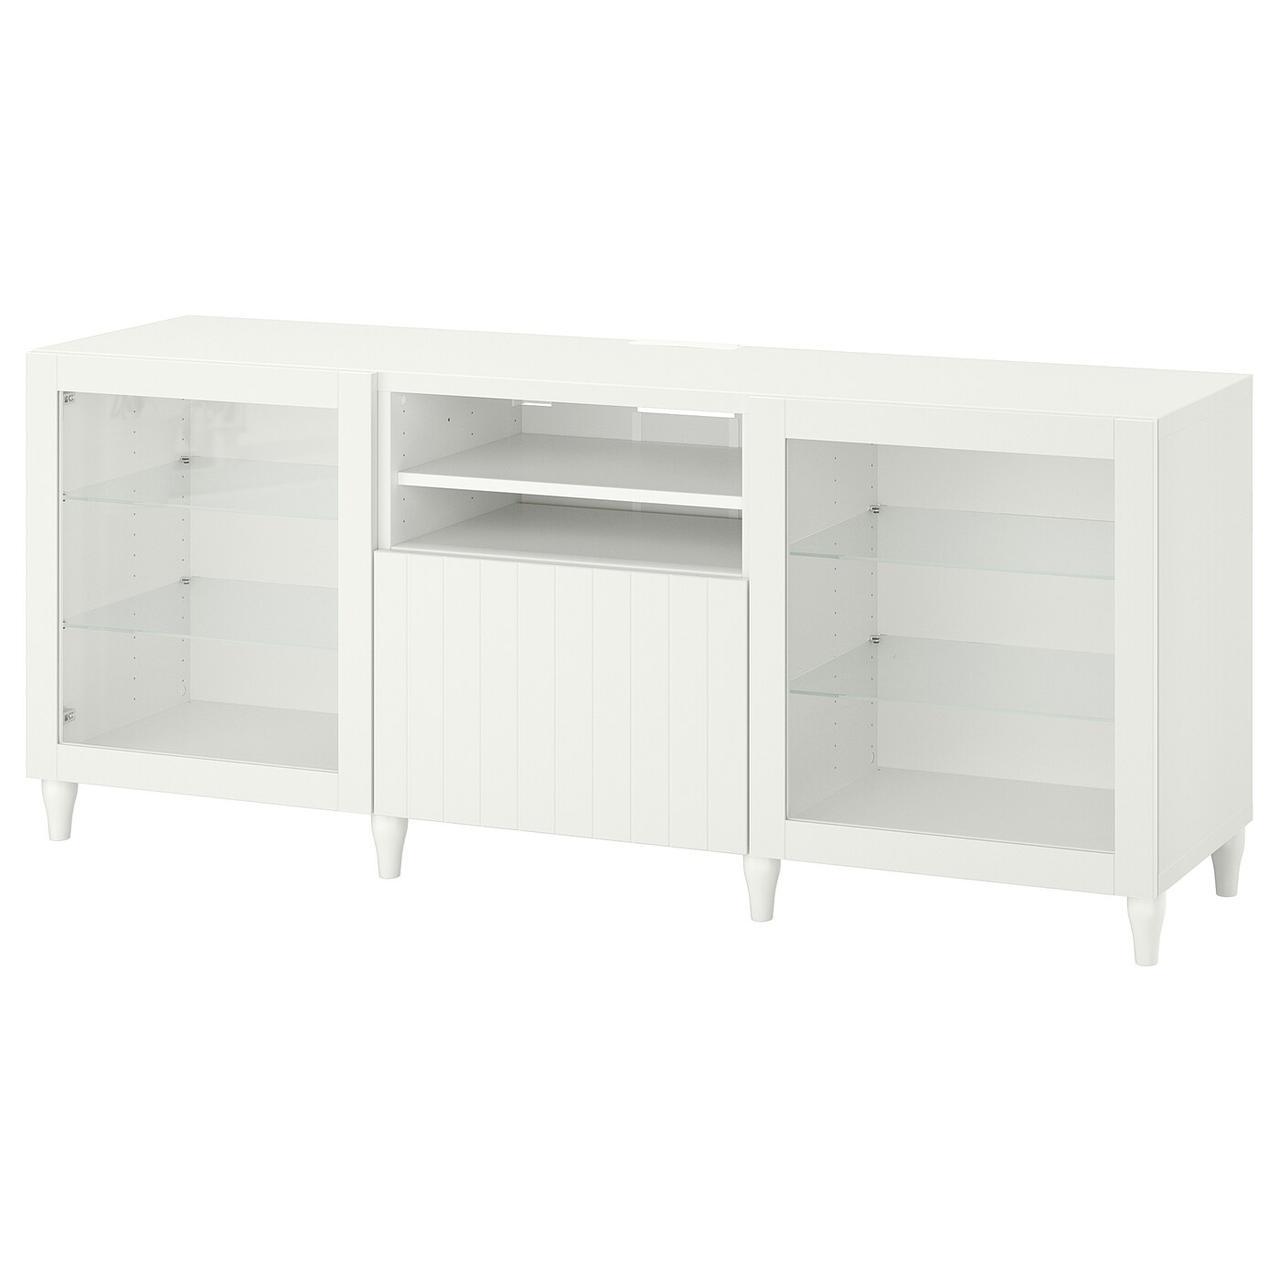 IKEA BESTÅ Тумба під ТБ з ящиками 180x42x74 см